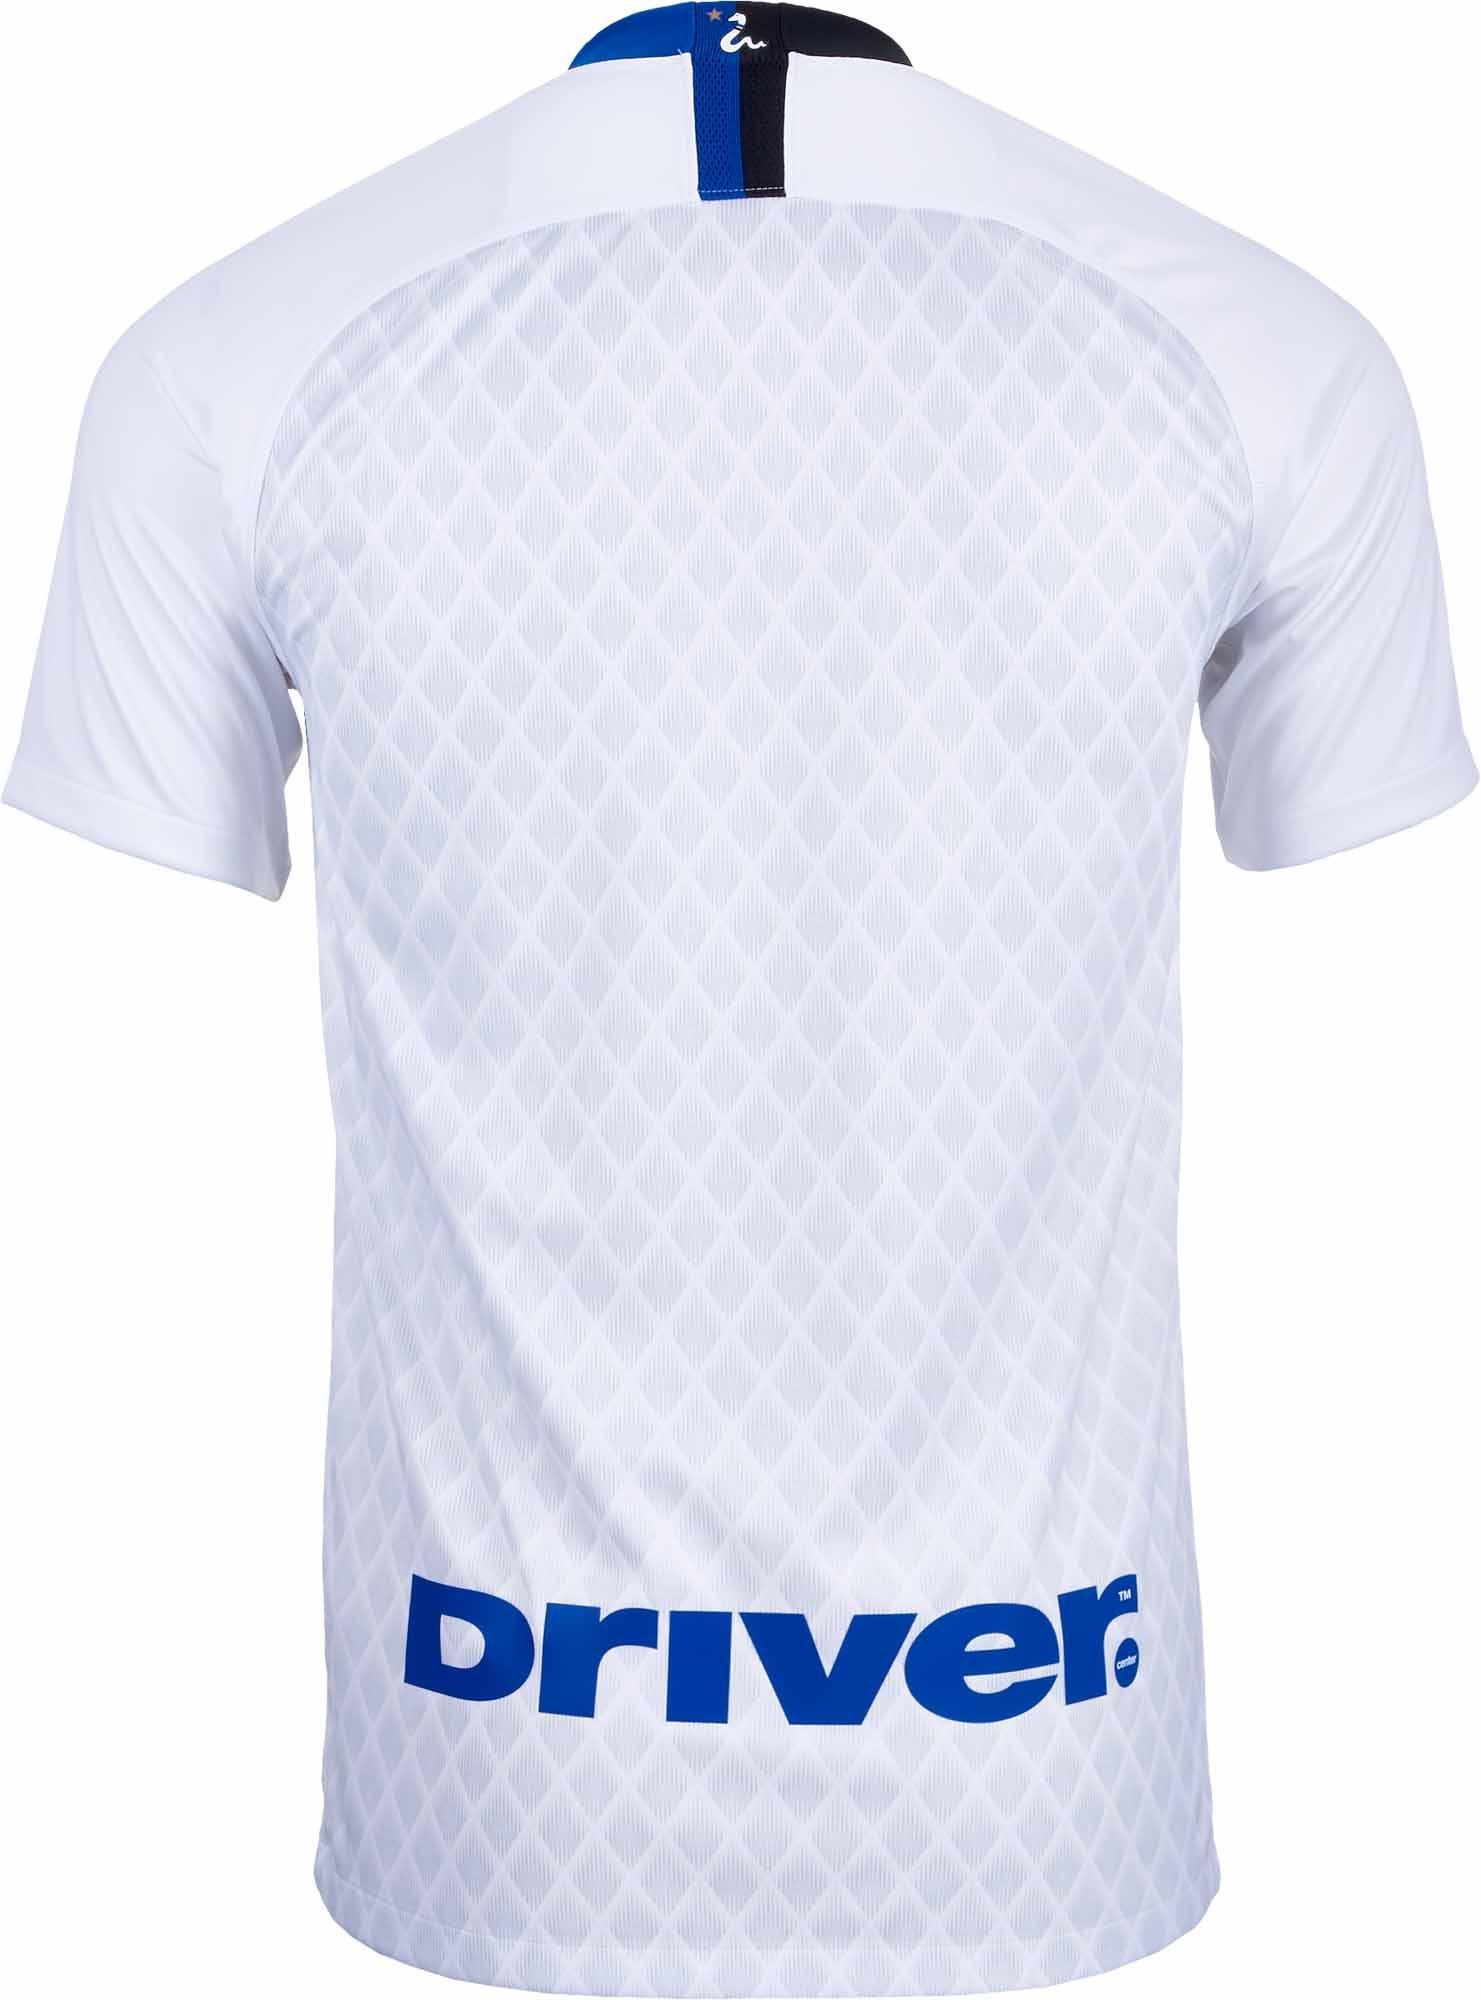 best service bcd76 9849b 2018/19 Nike Inter Milan Away Jersey - White/Black - SoccerPro